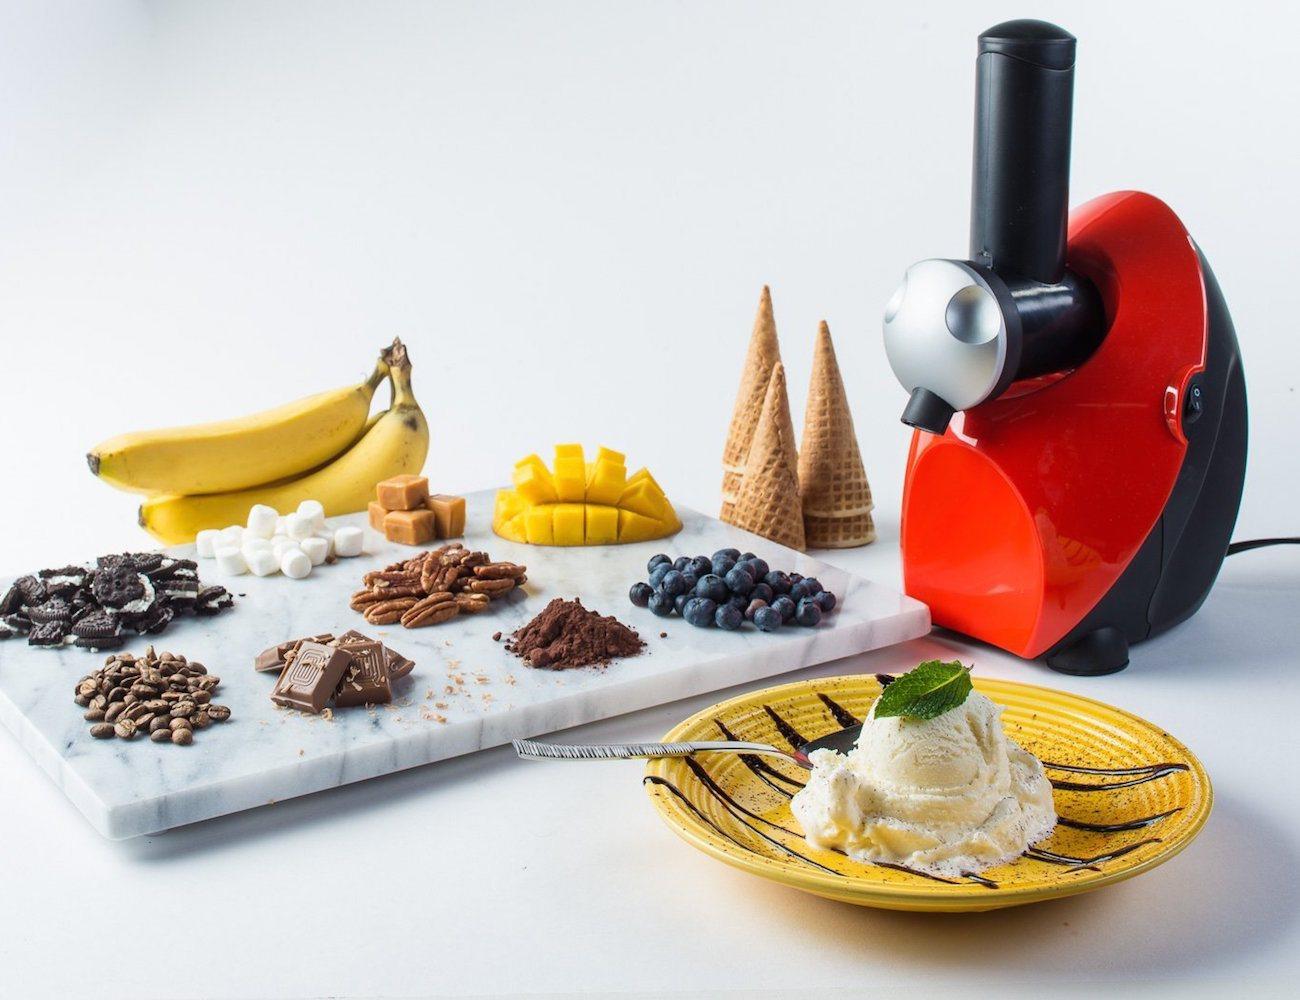 Chef's Star Frozen Yogurt & Dessert Maker